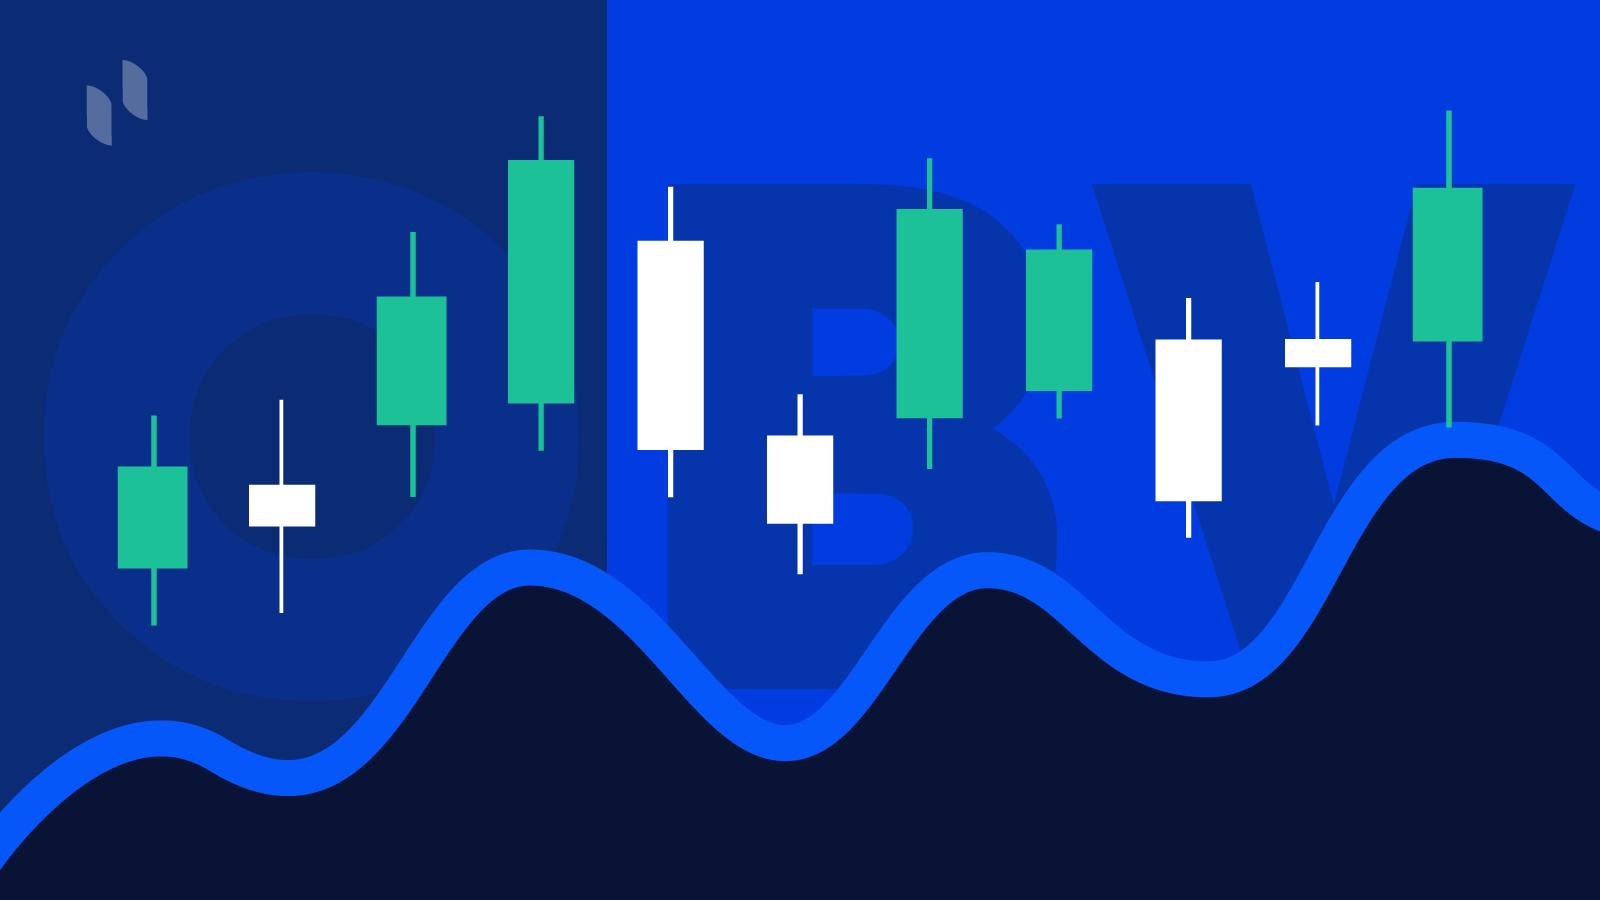 On Balance Volume (OBV) indicator